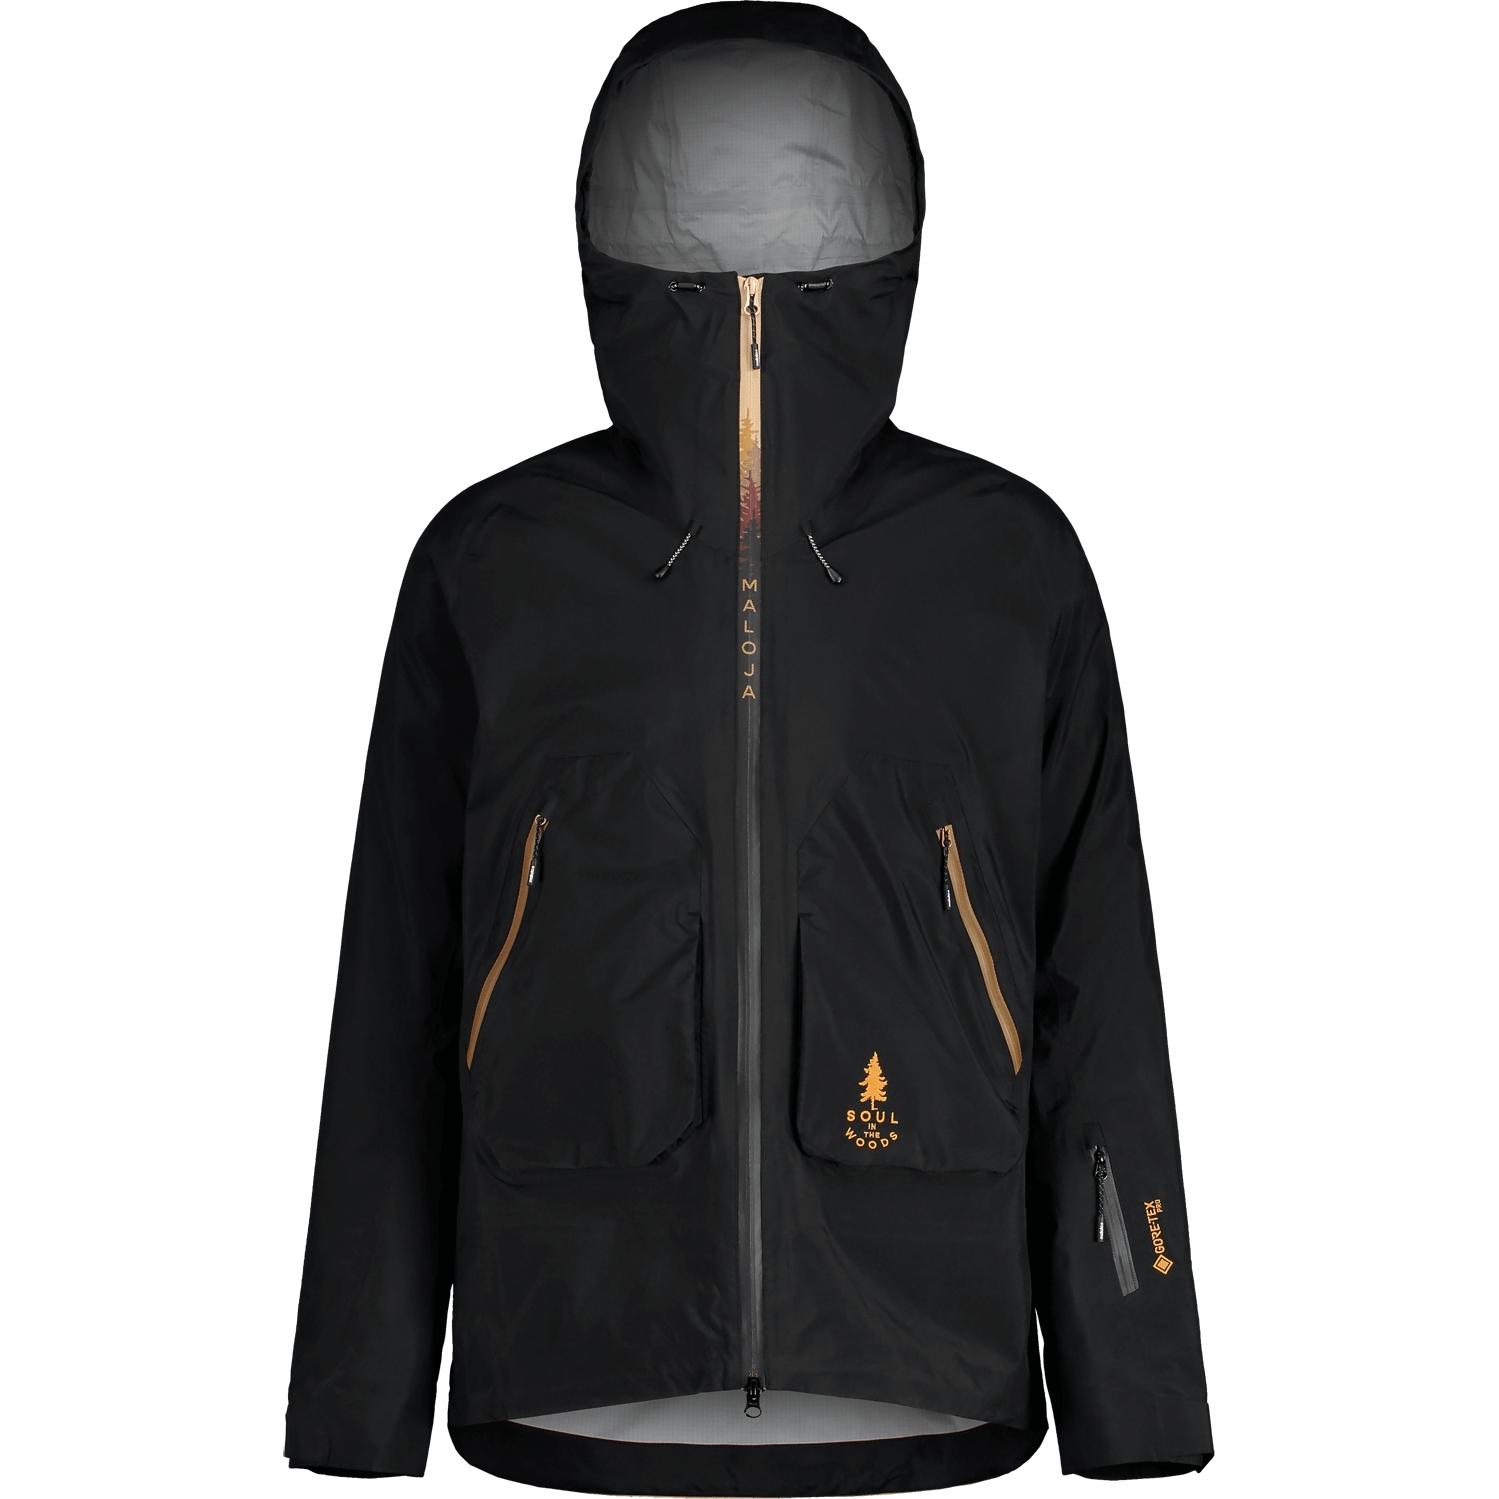 Maloja KlausM. High Tech Jacket - moonless 0817